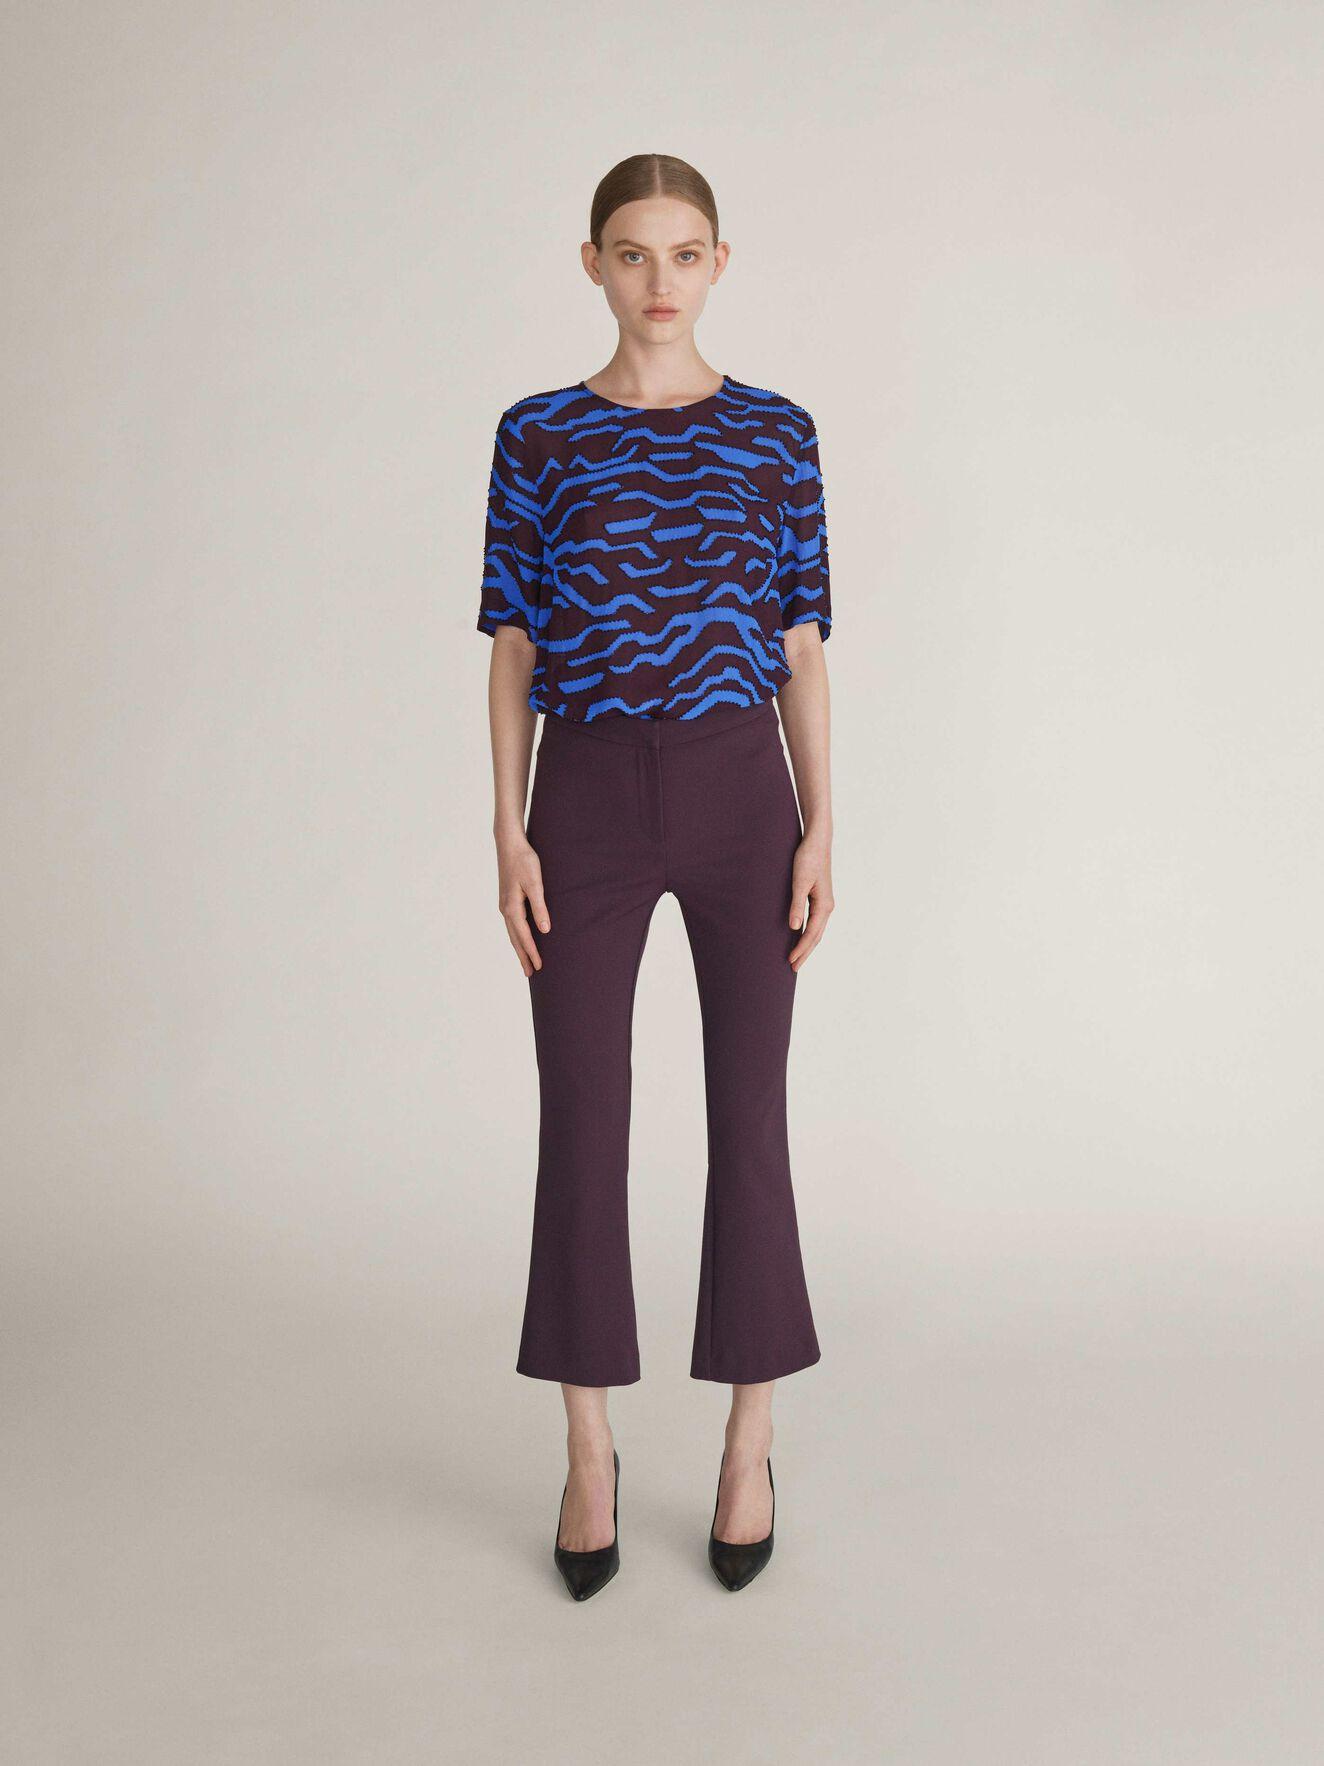 Noora Trousers in Juicy Plum from Tiger of Sweden